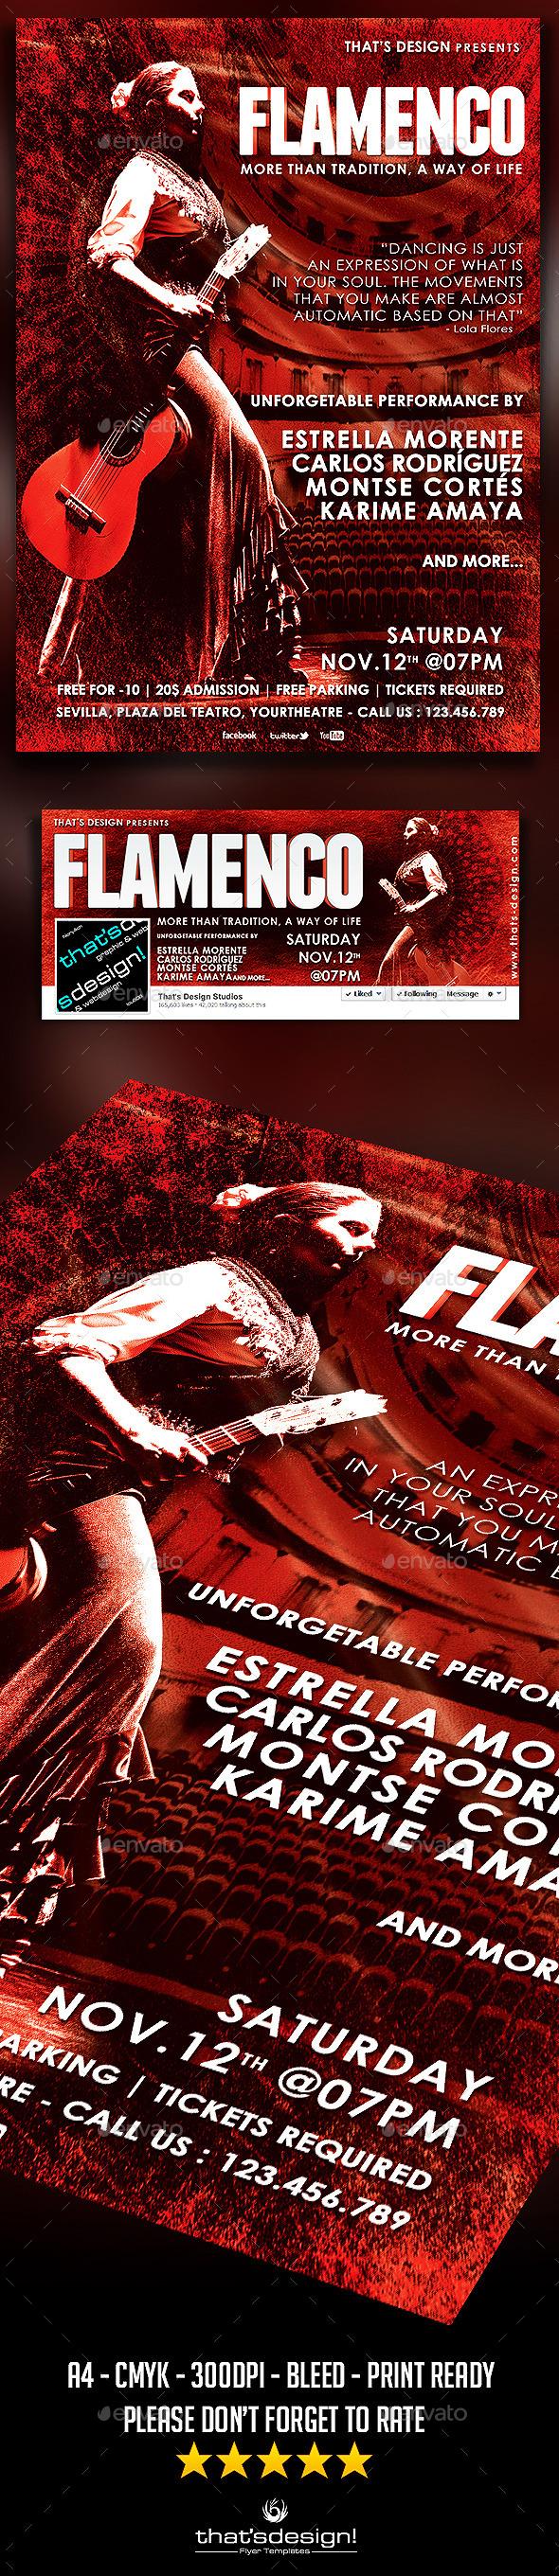 8 5x11 poster design - Flamenco Flyer Template V1